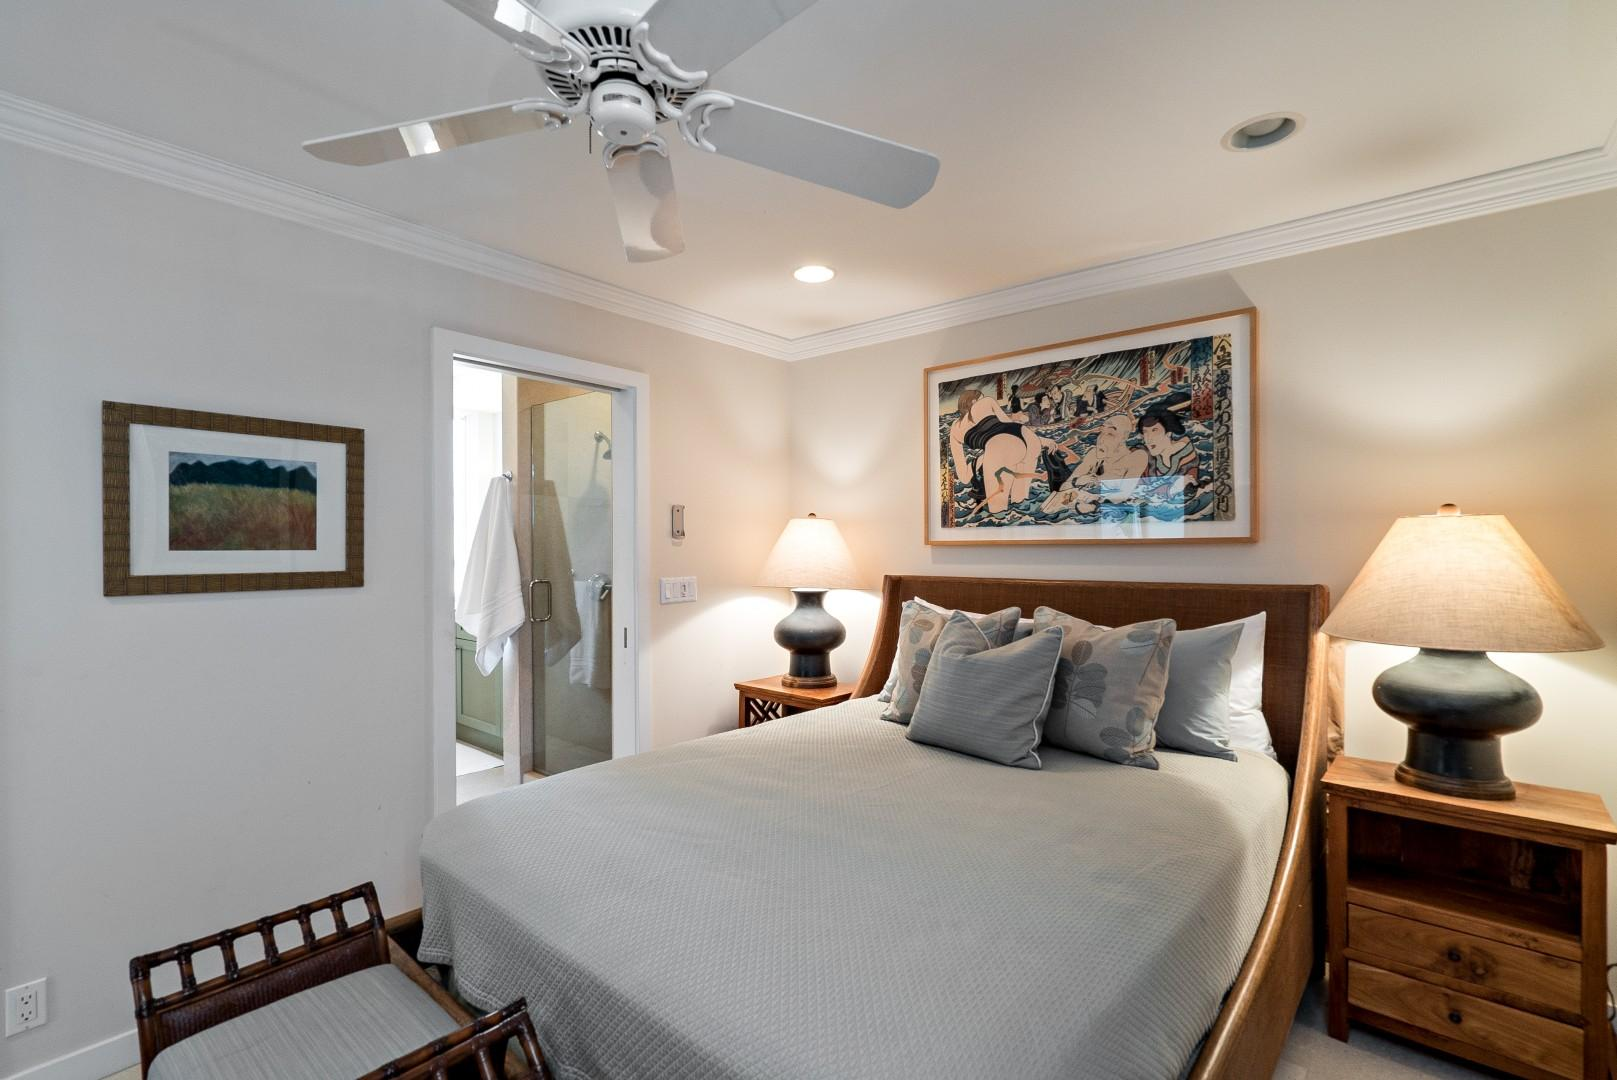 Pool house guest bedroom